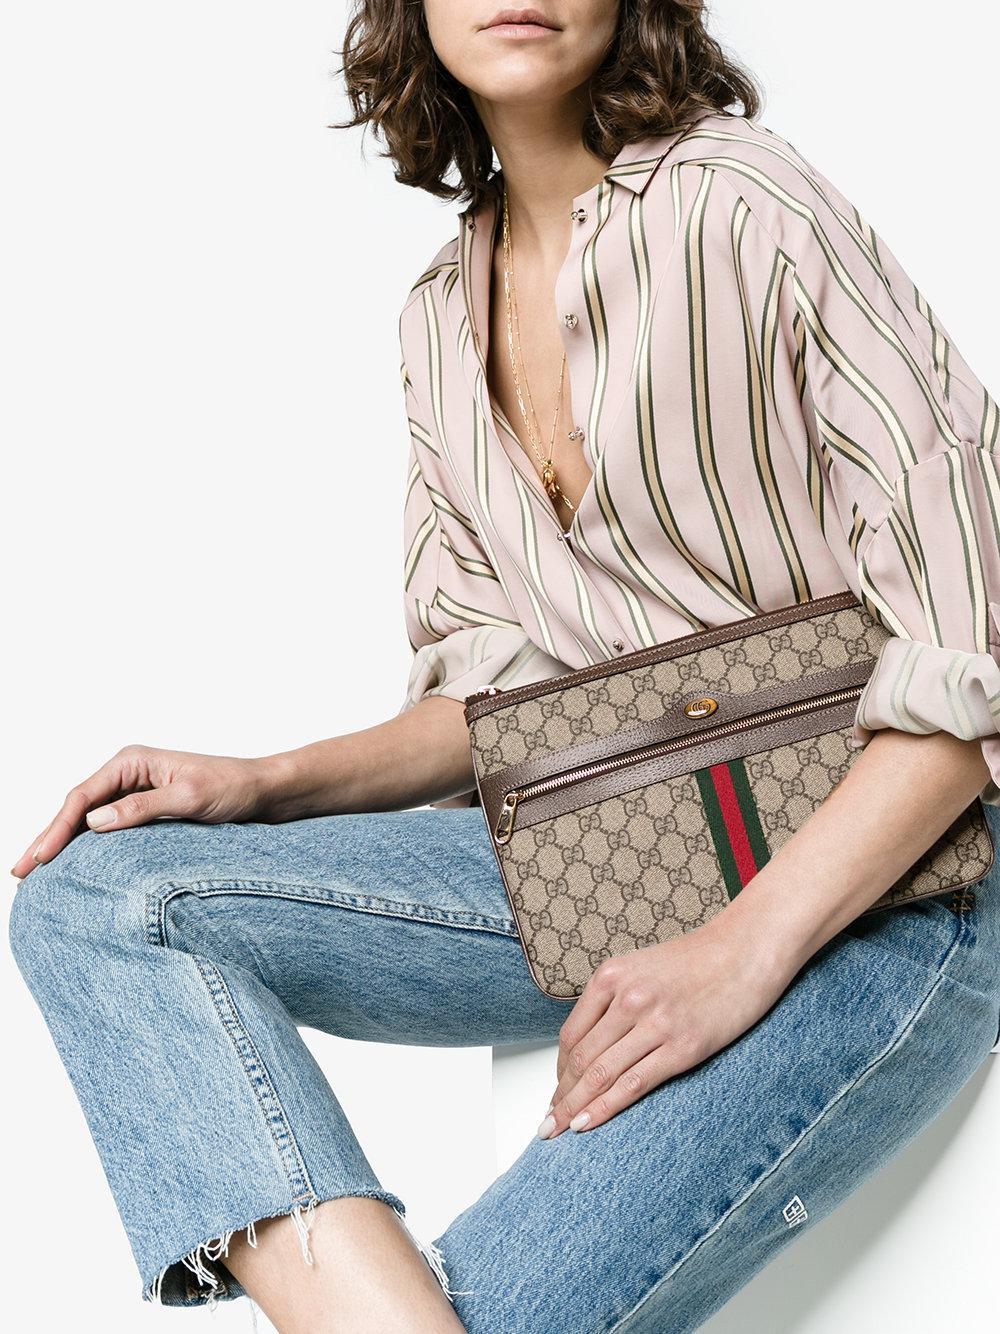 0da3b1b3ae3 Gucci - Brown Ophidia GG Supreme Leather Pouch - Lyst. View fullscreen